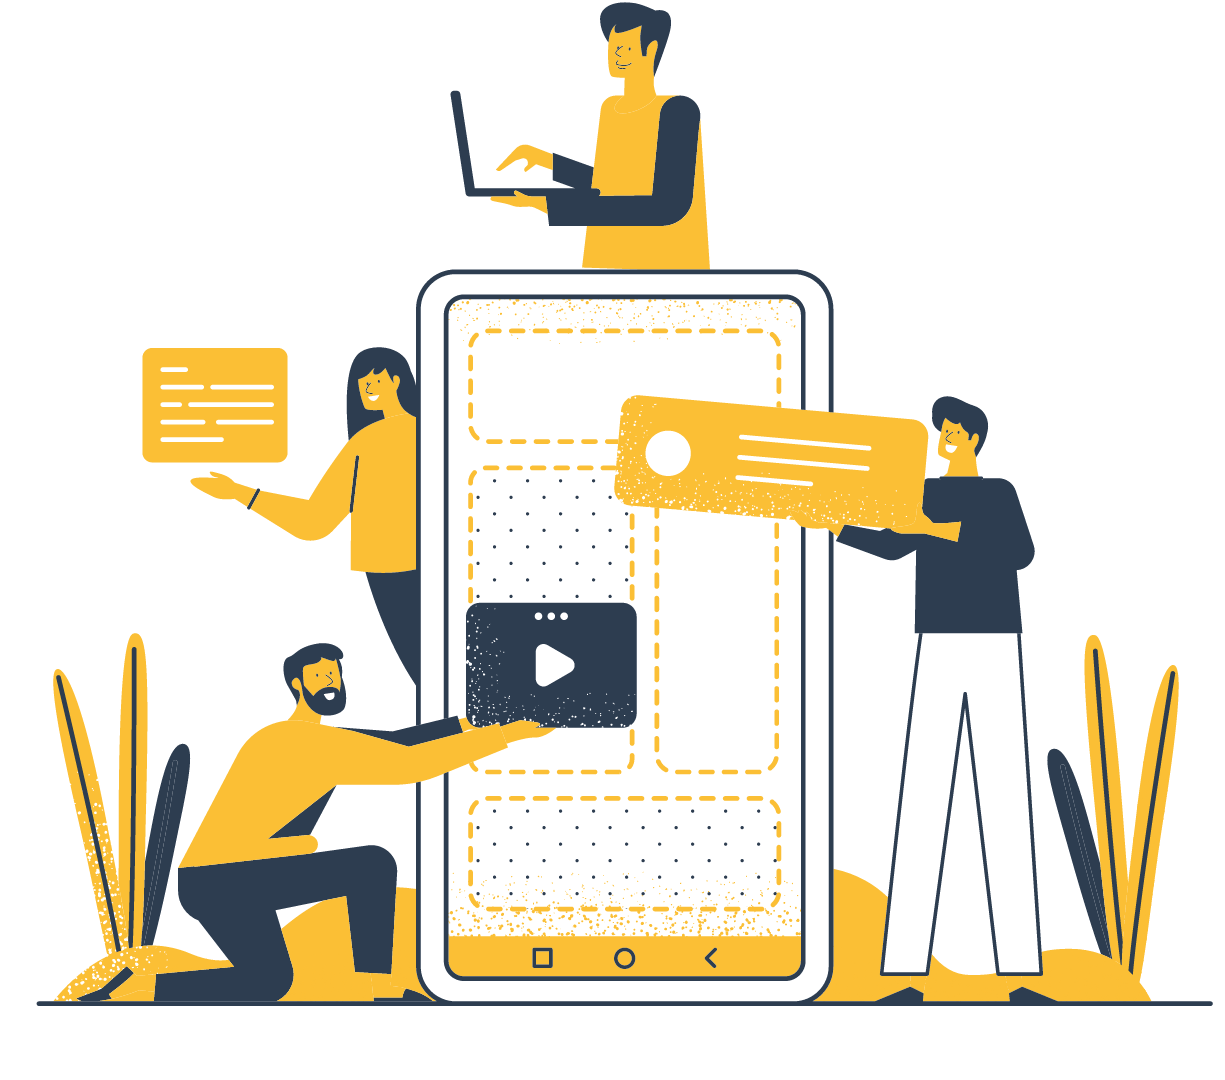 Kommunikationsformat Video